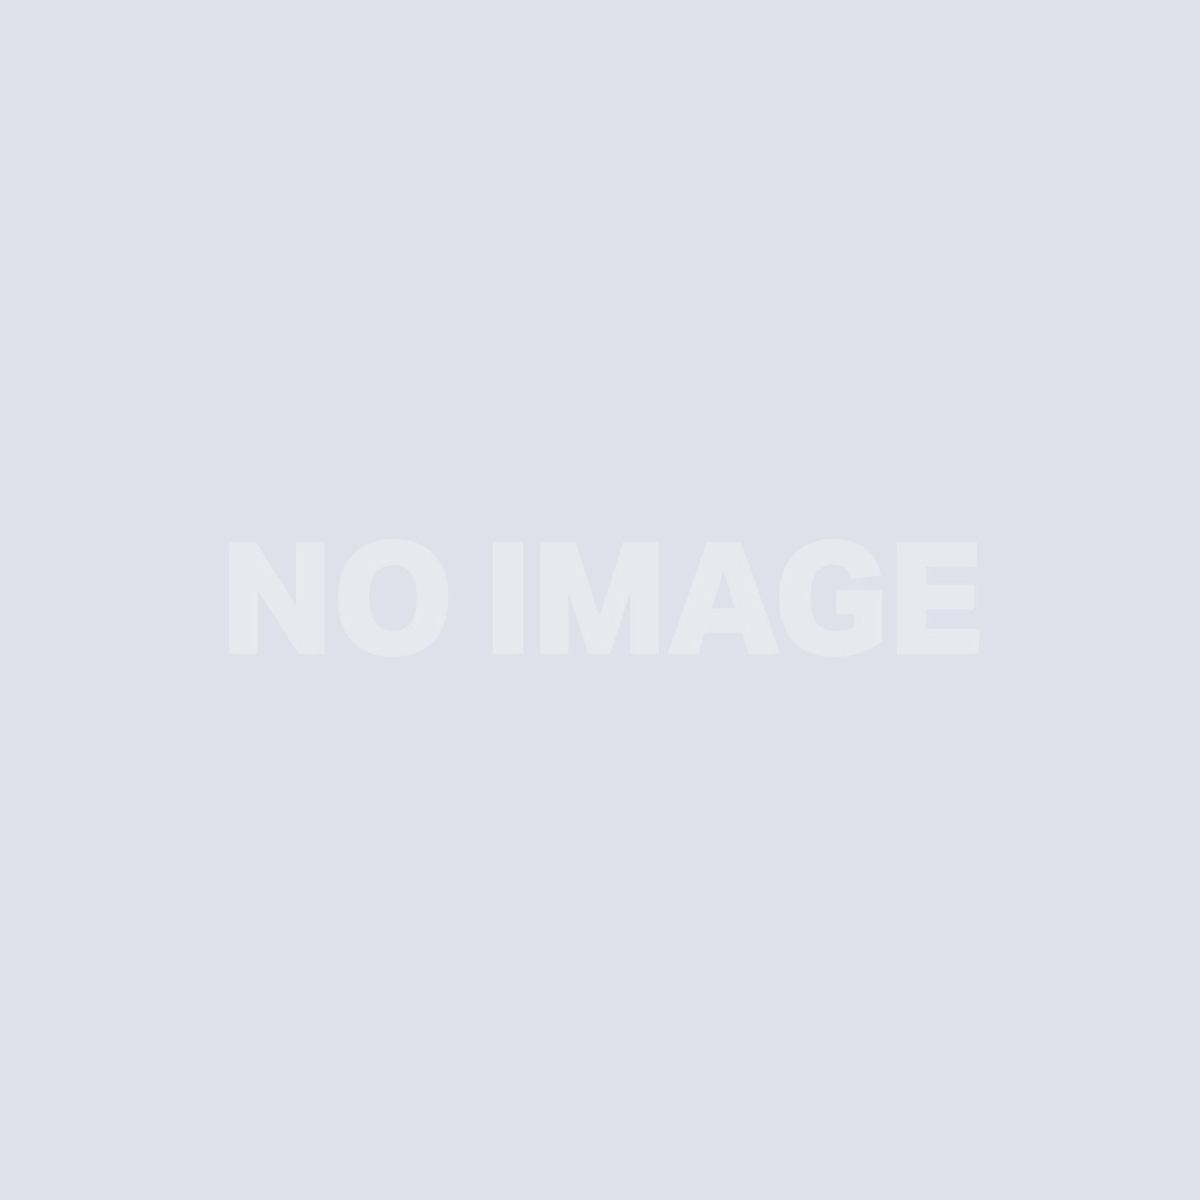 38/47.5/47.5/20 Nylon Climber Roller with Plain Bore - Black